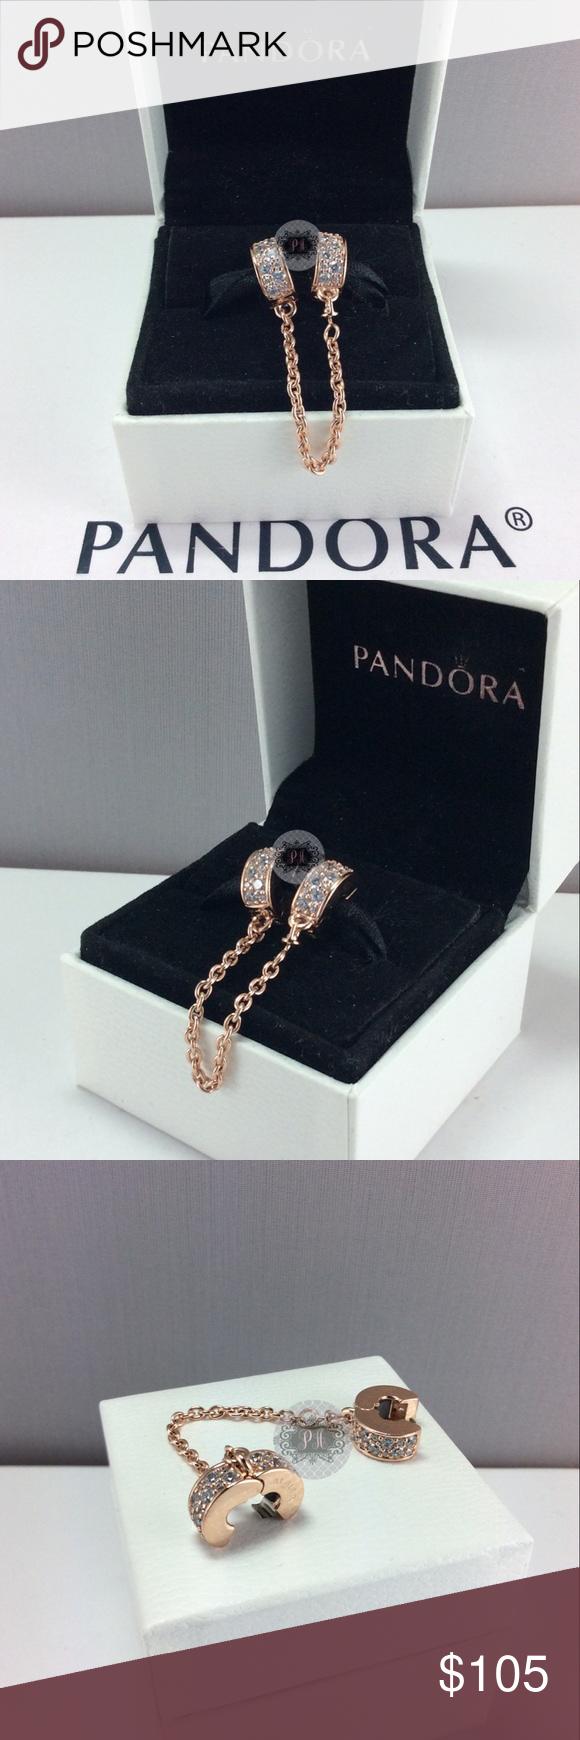 e36498dc18d36 New Pandora Rose Shining Elegance Safety Chain Authentic Pandora ...